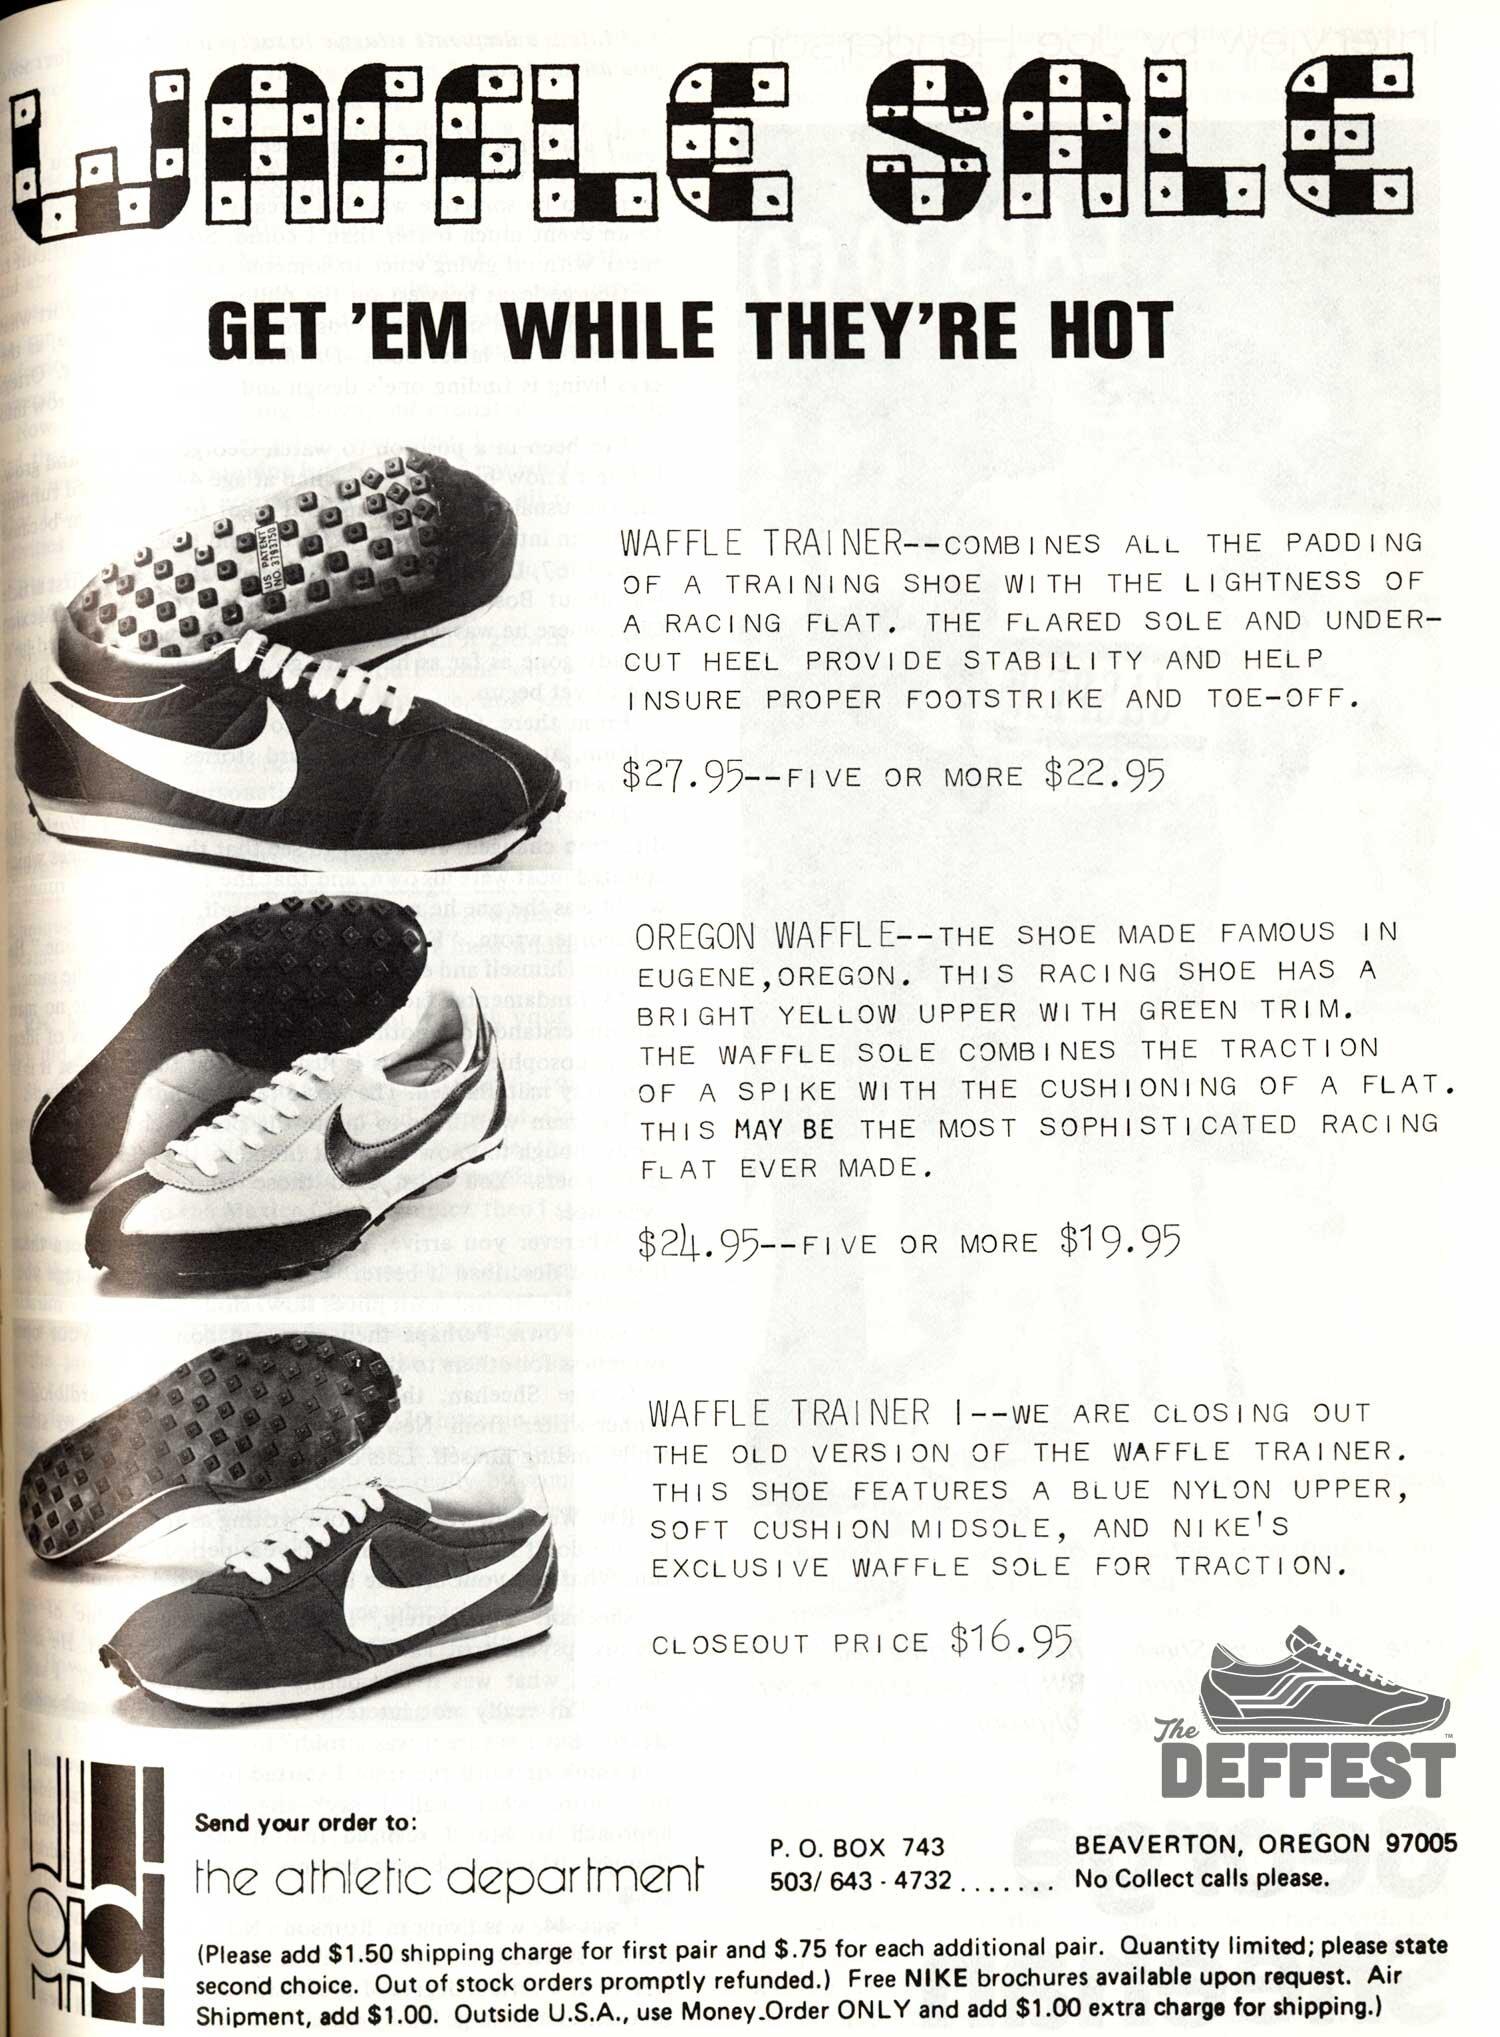 Vintage Nike Ad The Deffest A Vintage And Retro Sneaker Blog Vintage Ads